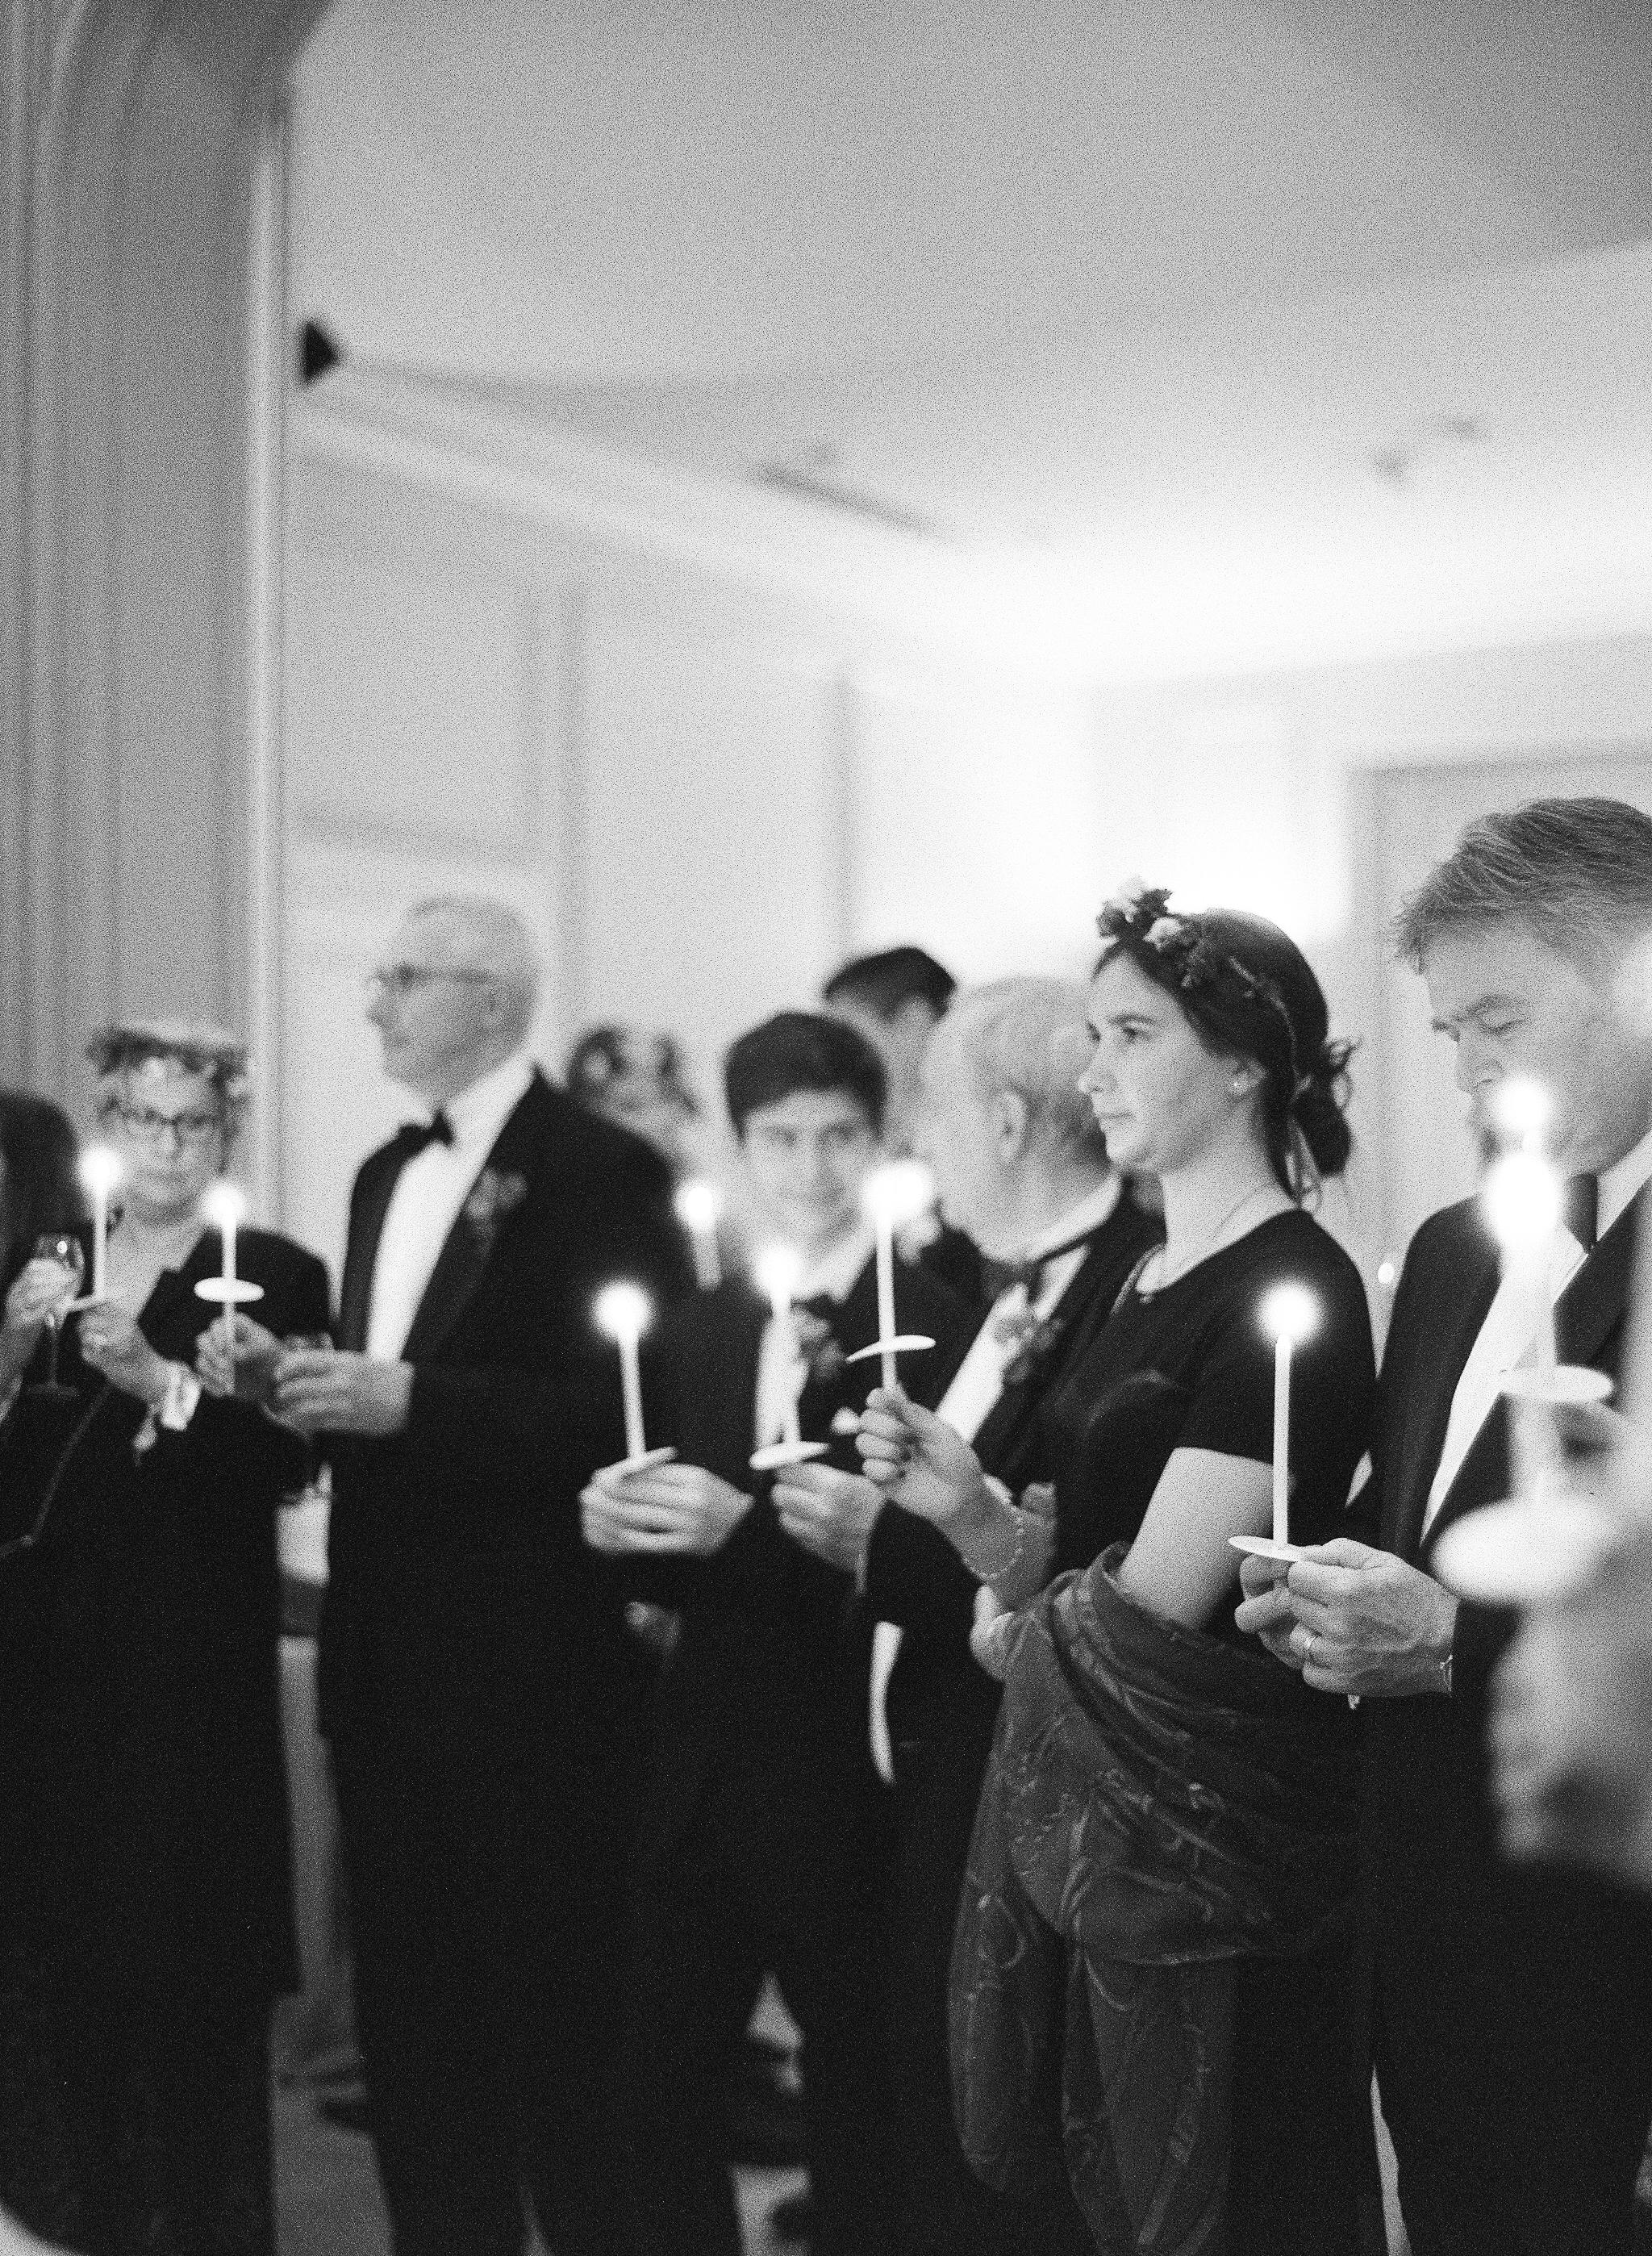 Ellen and Jeremy Wedding-Paris France-Carrie King Photographer-208.jpg